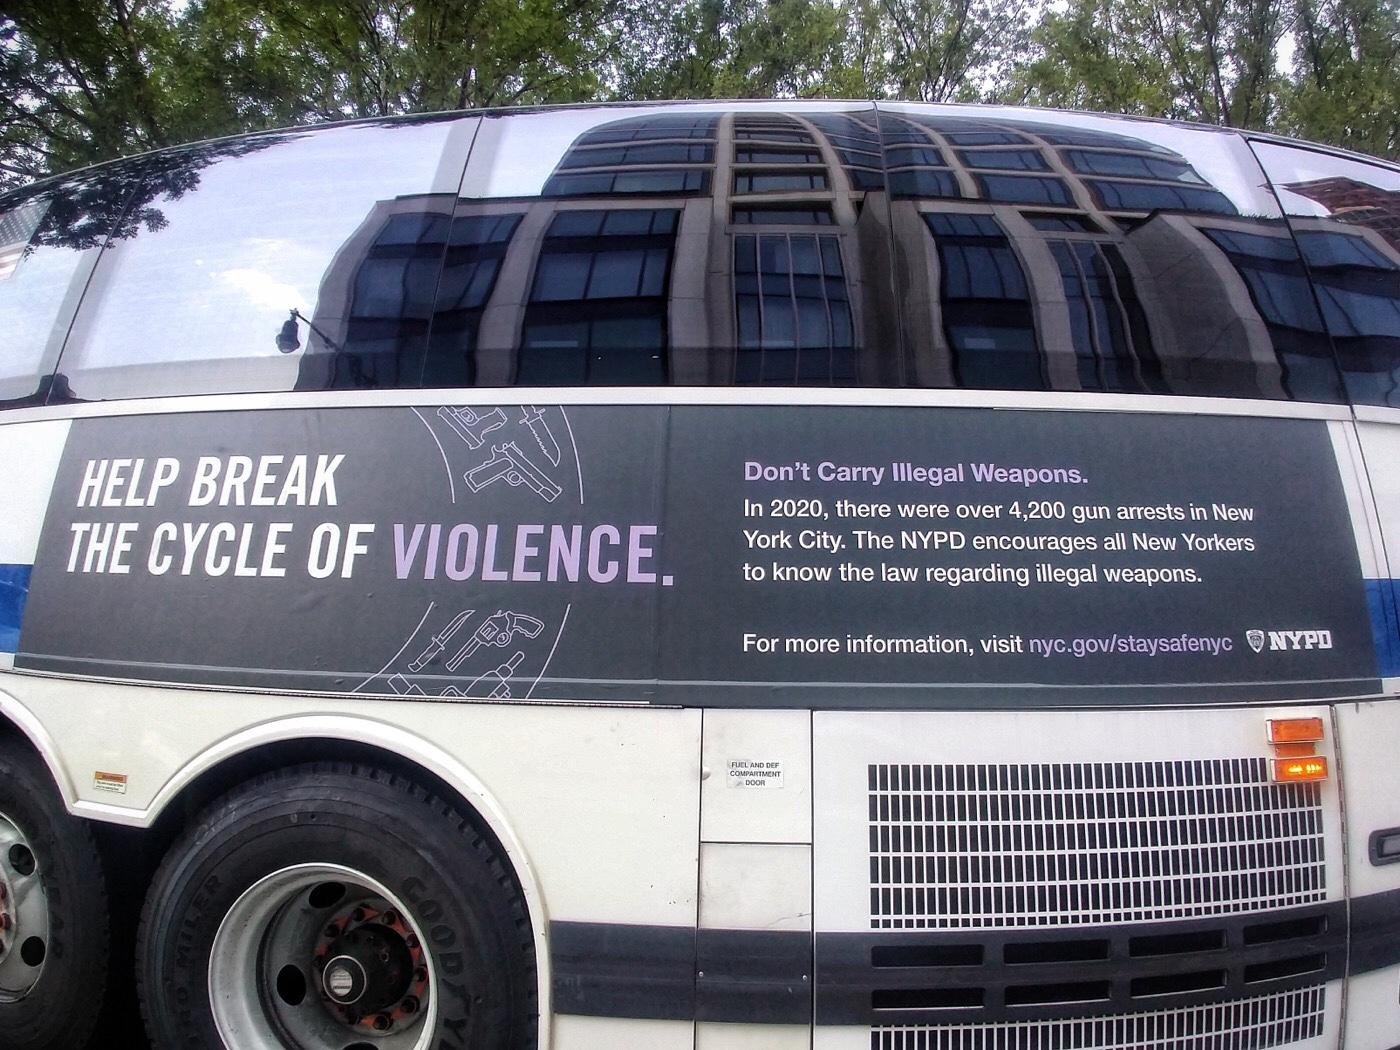 New York, MTA bus, Help Break the Cycle of Violence, iIlegal weapons